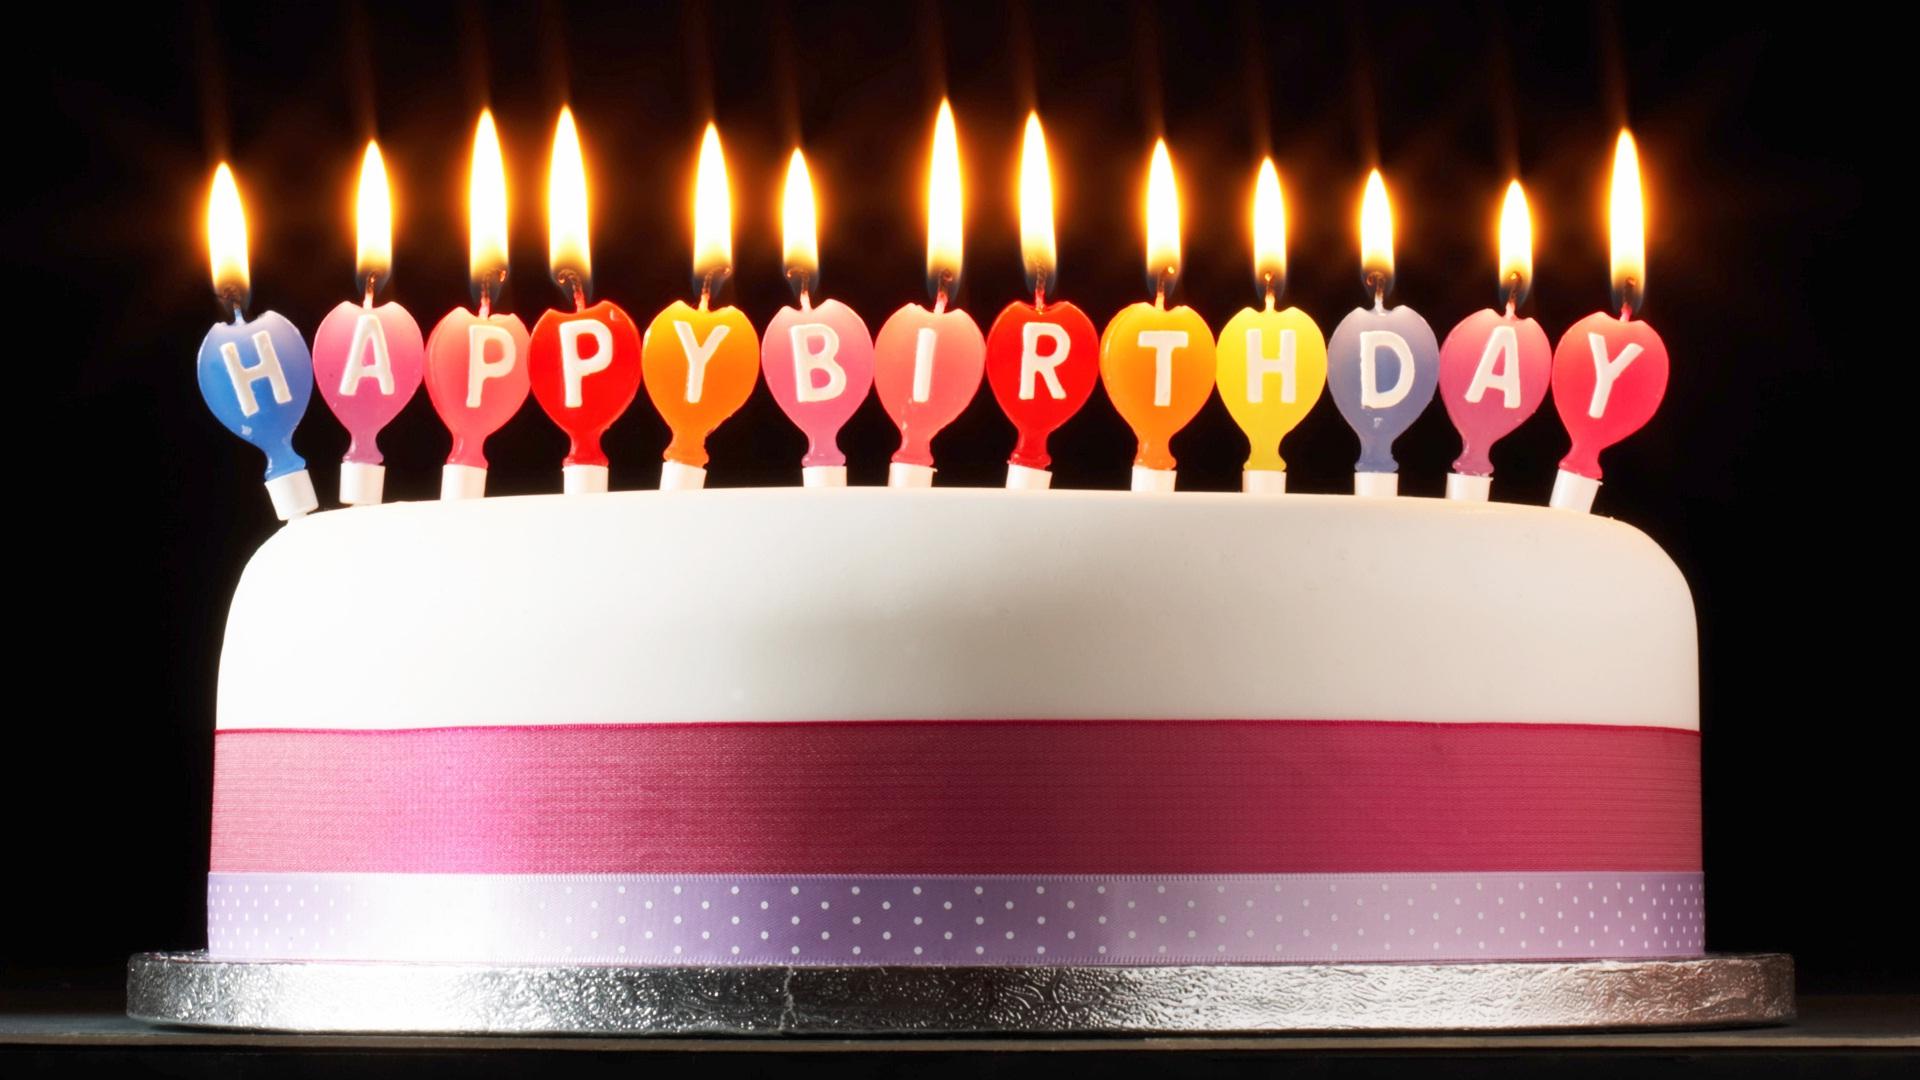 Birthday Cake Picture Free Download Happy Birthday Cake Photo